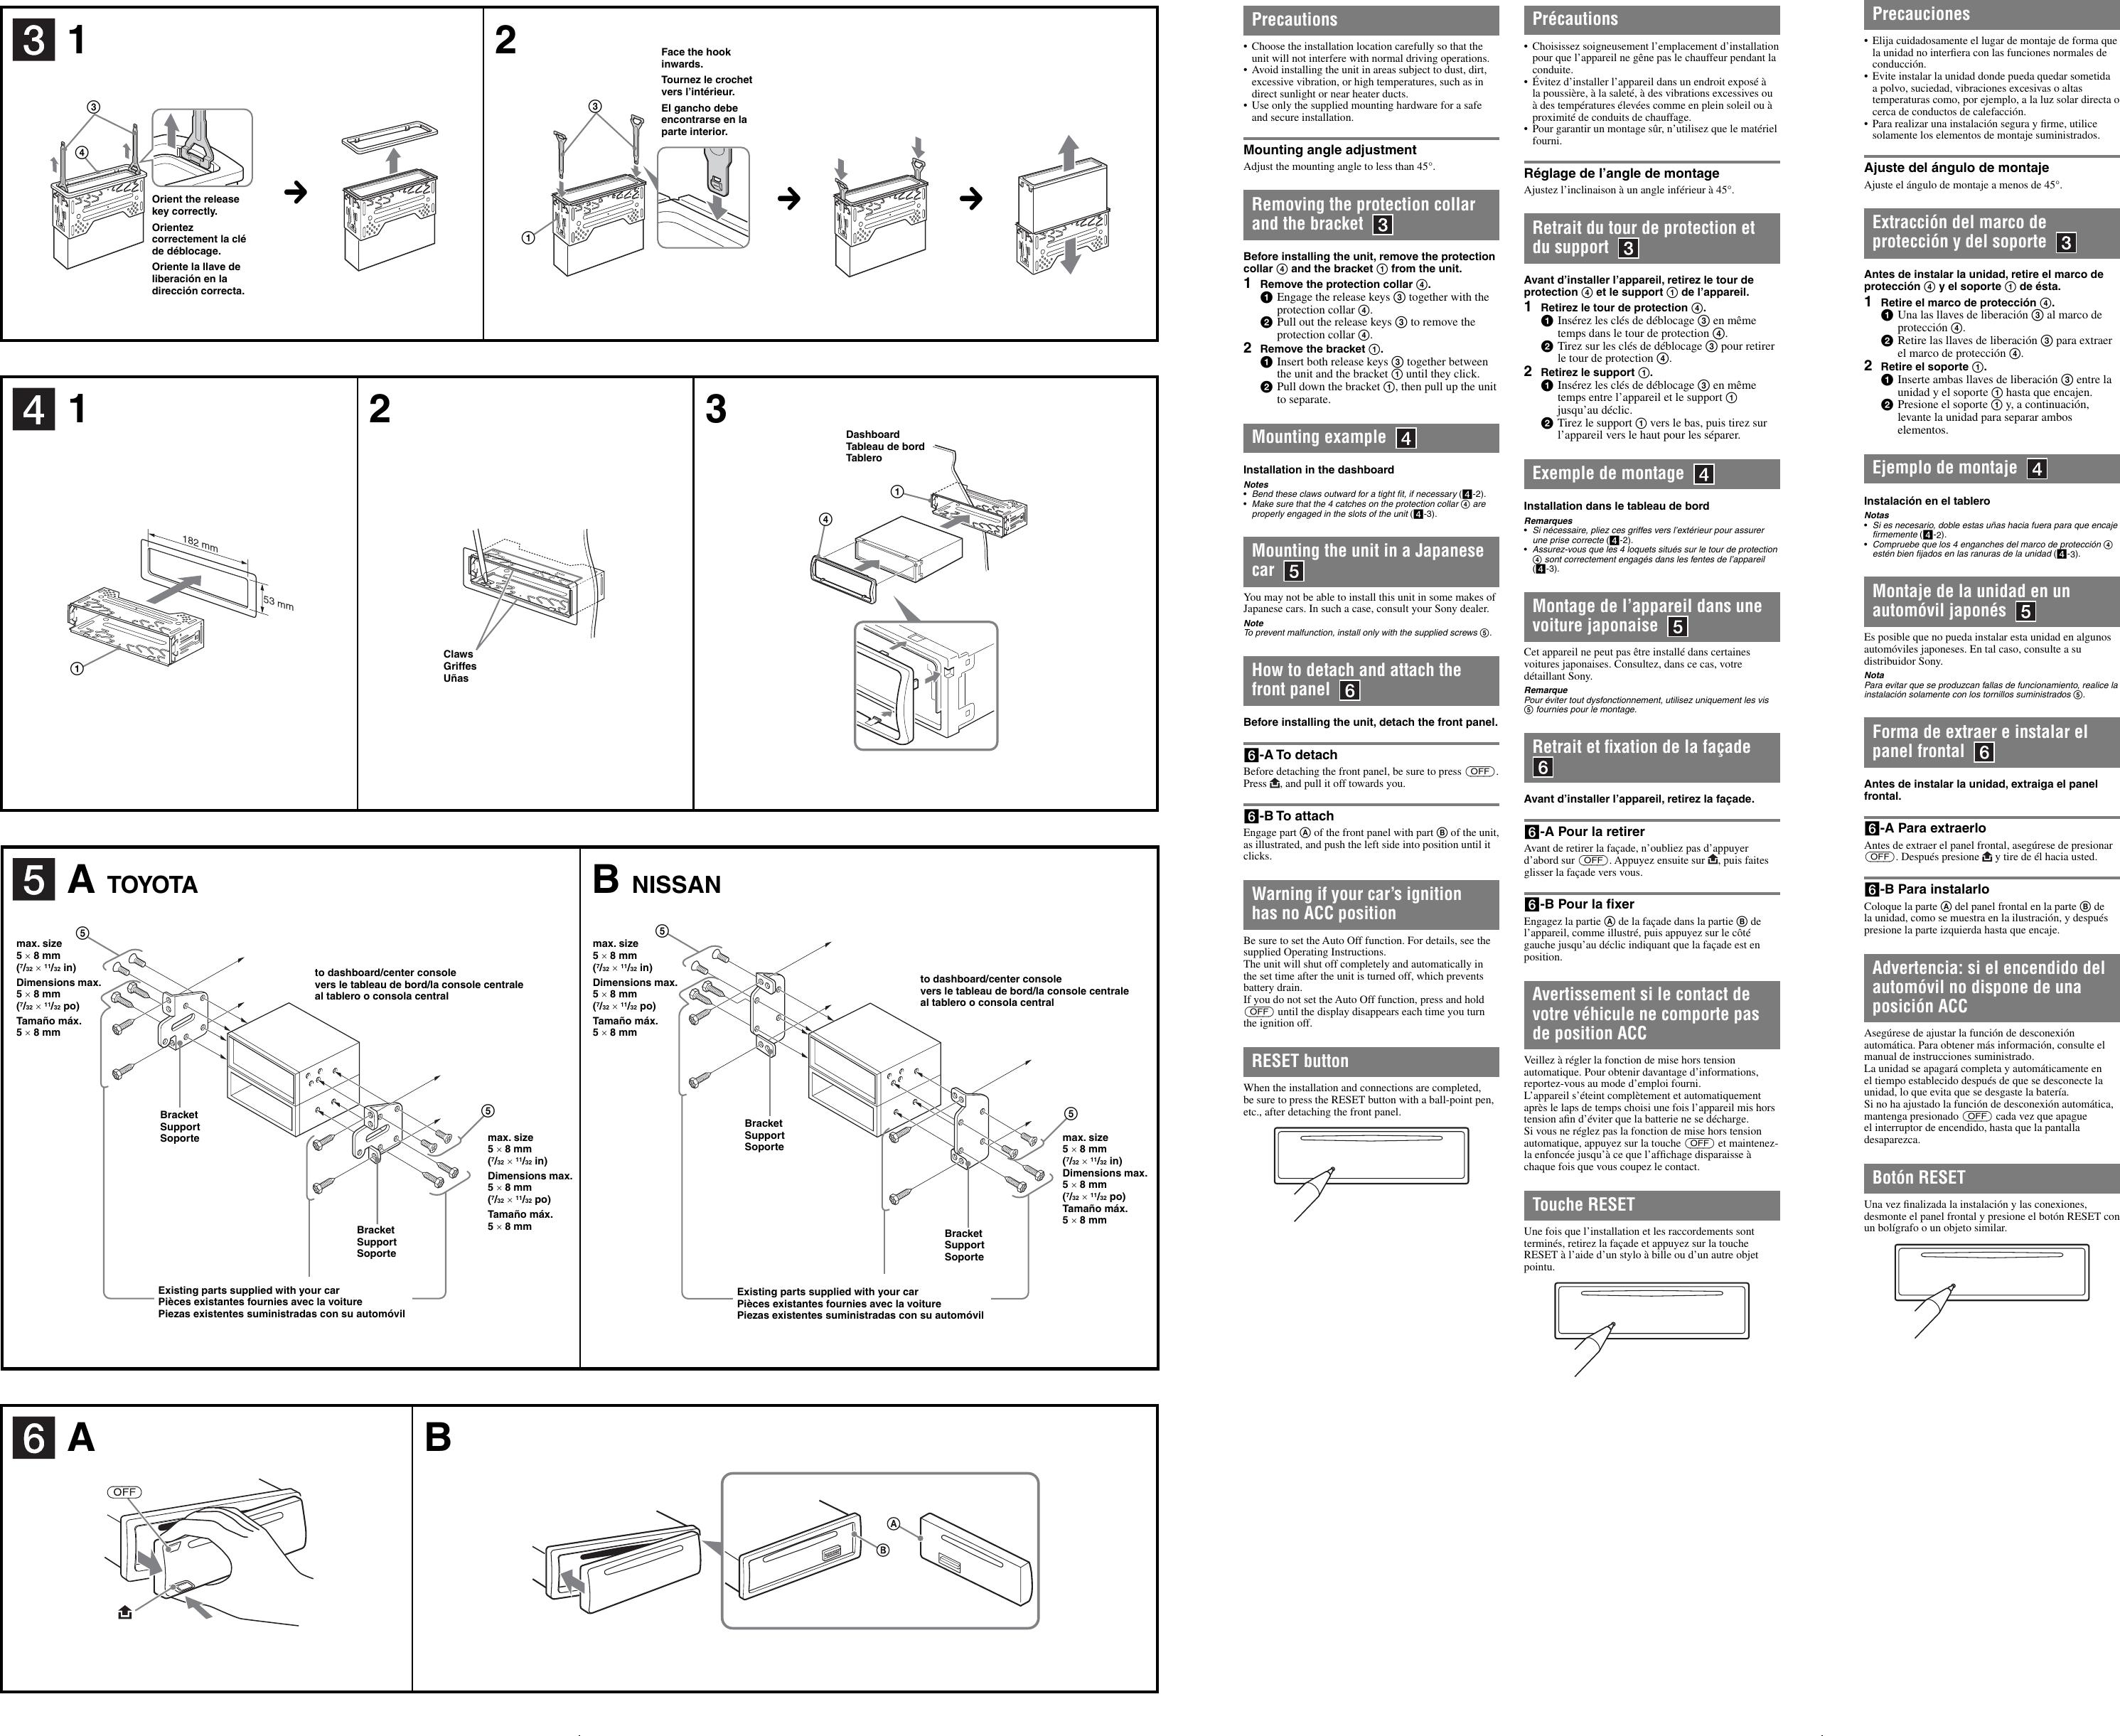 Sony Mex Bt3100p Wiring Diagram Schematic Diagrams Car Stereo Bt3700u Contemporary N4000bt Gallery